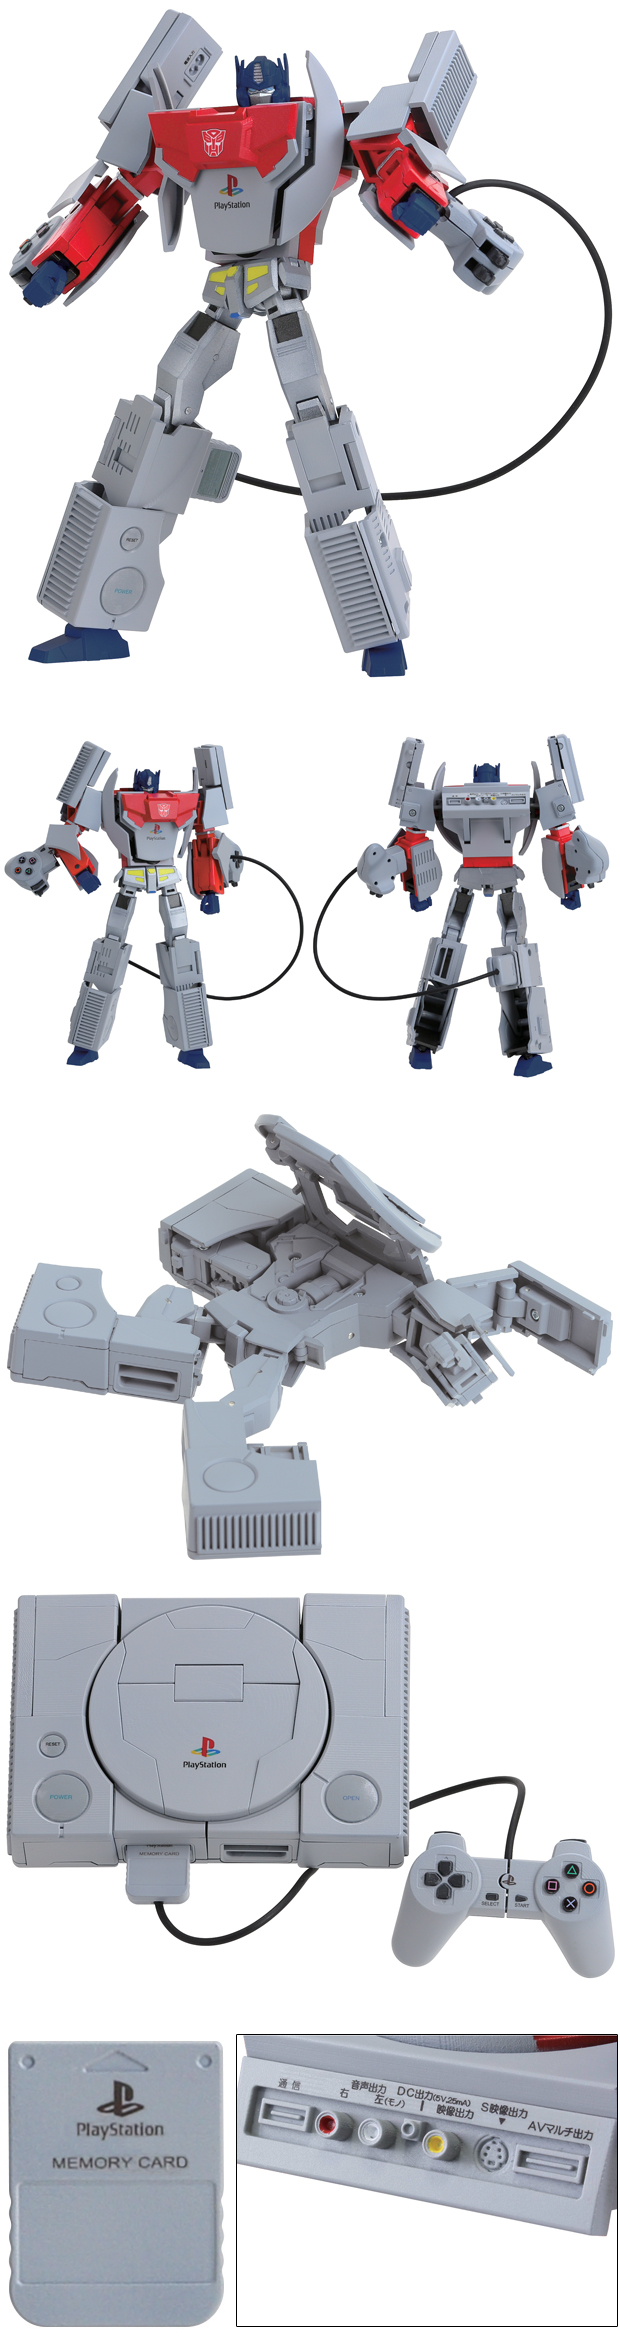 PlayStation-transformers